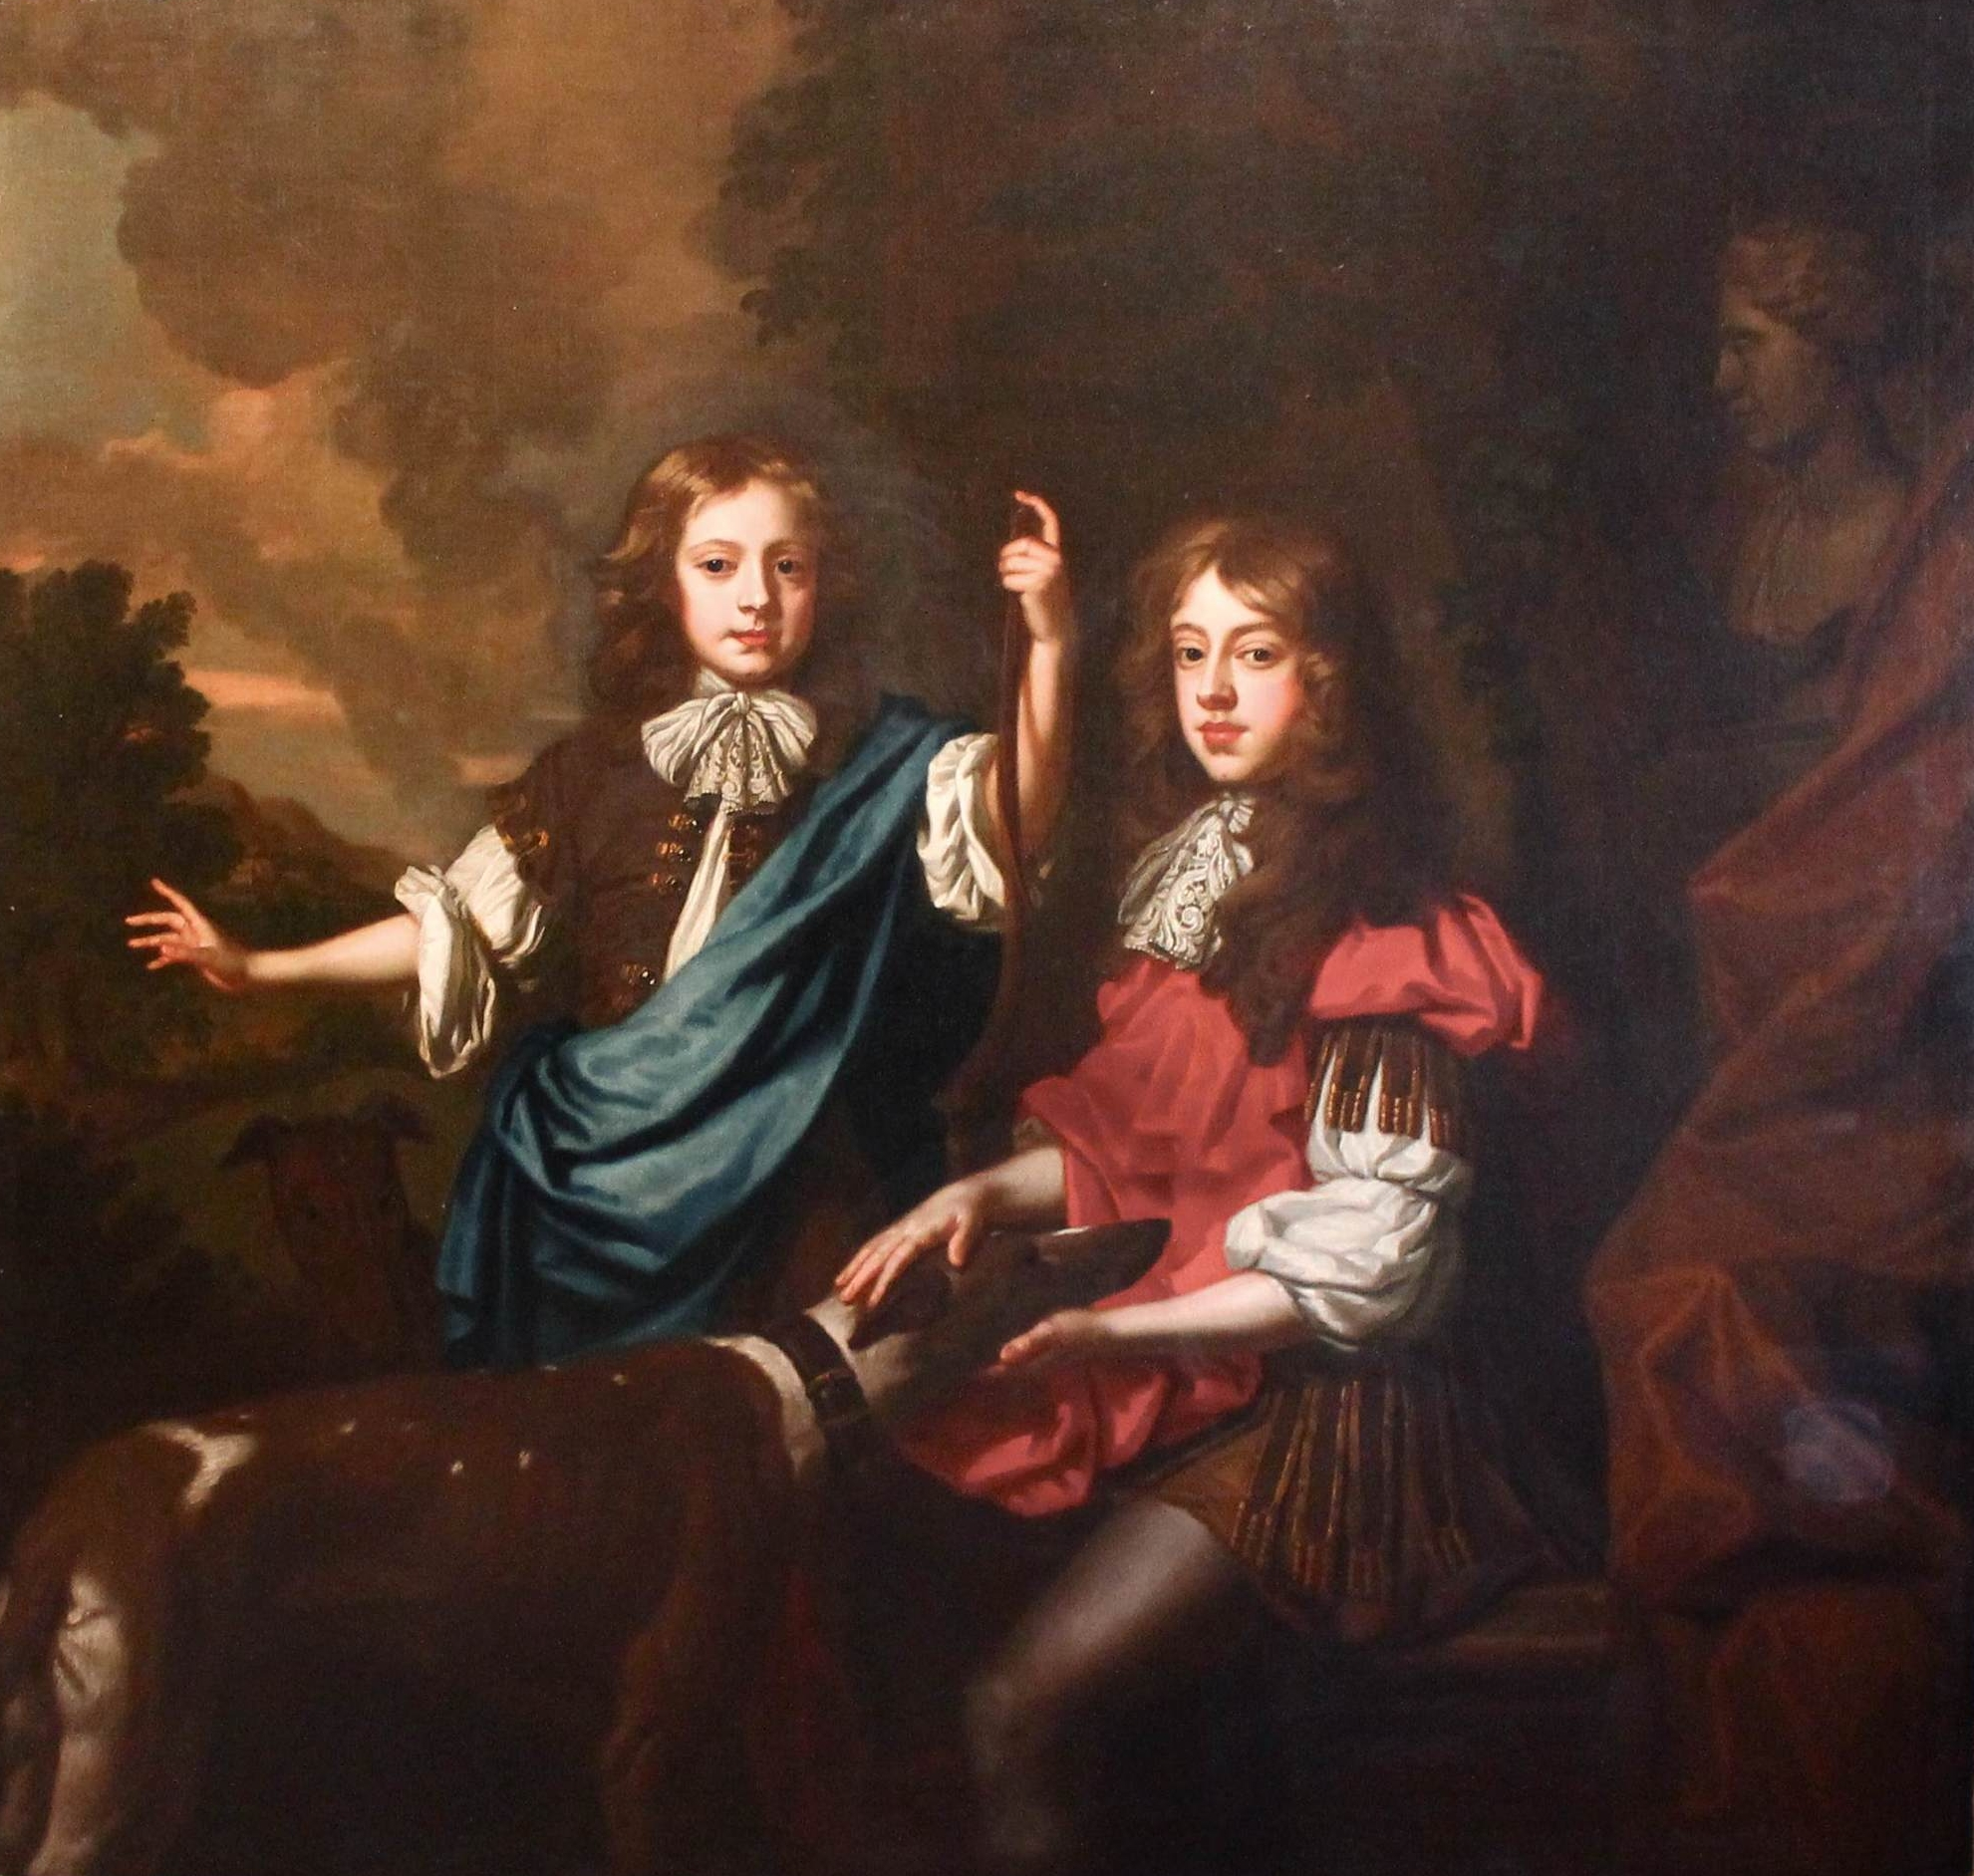 Willem Wissing (1656-1687) The Lennard Double Portrait c.1675